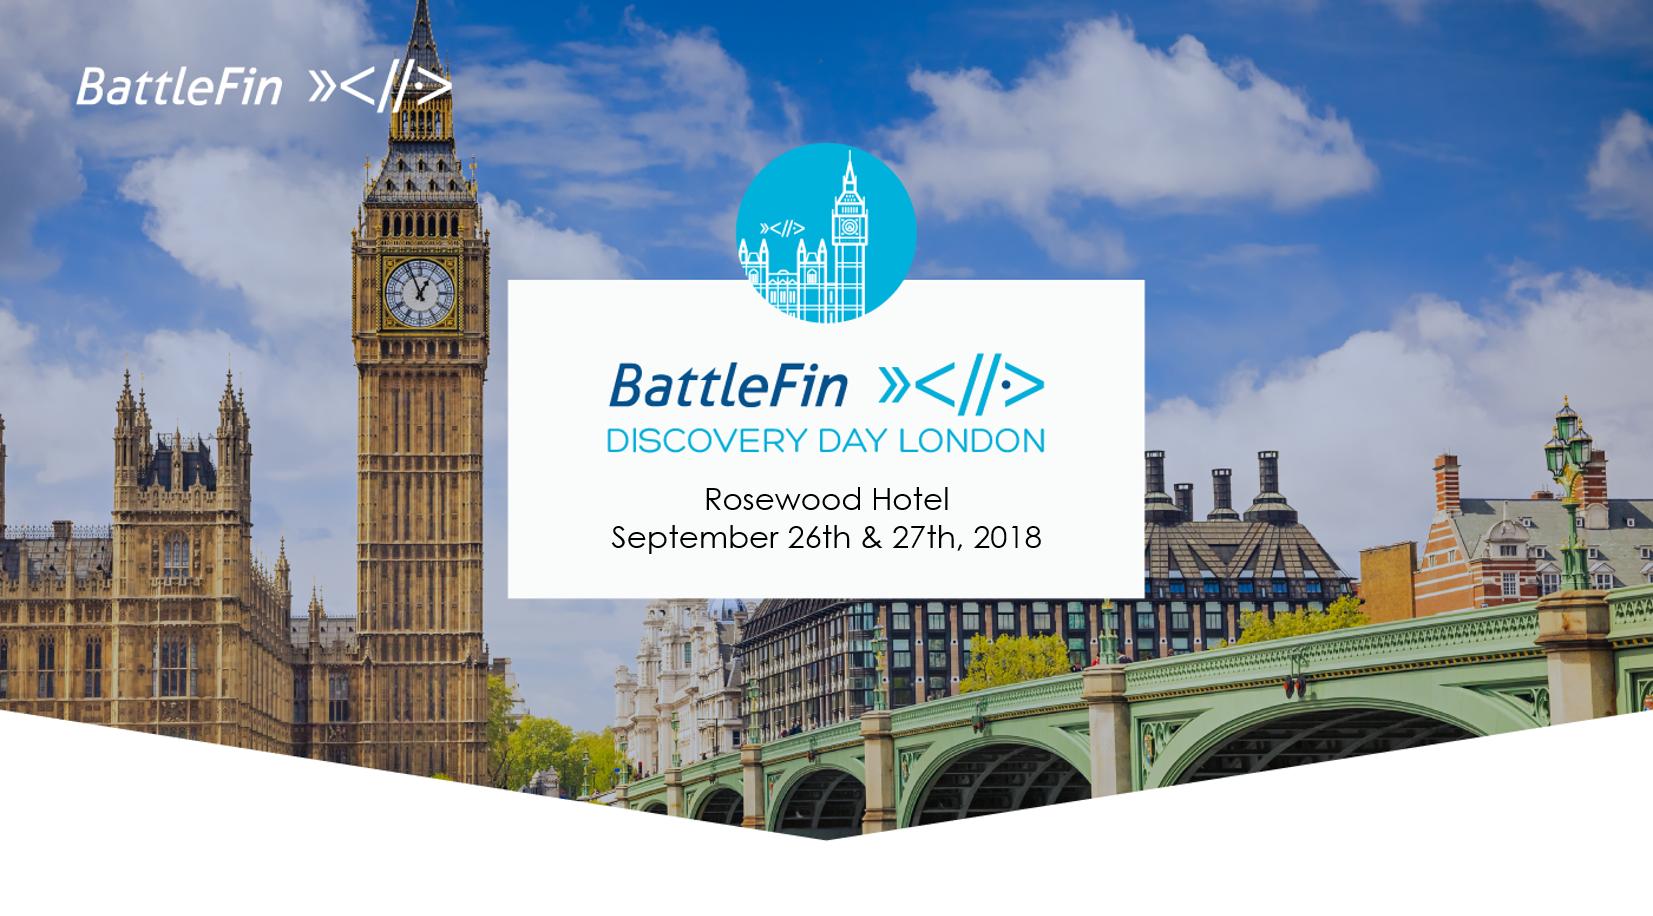 Battlefin London 2018